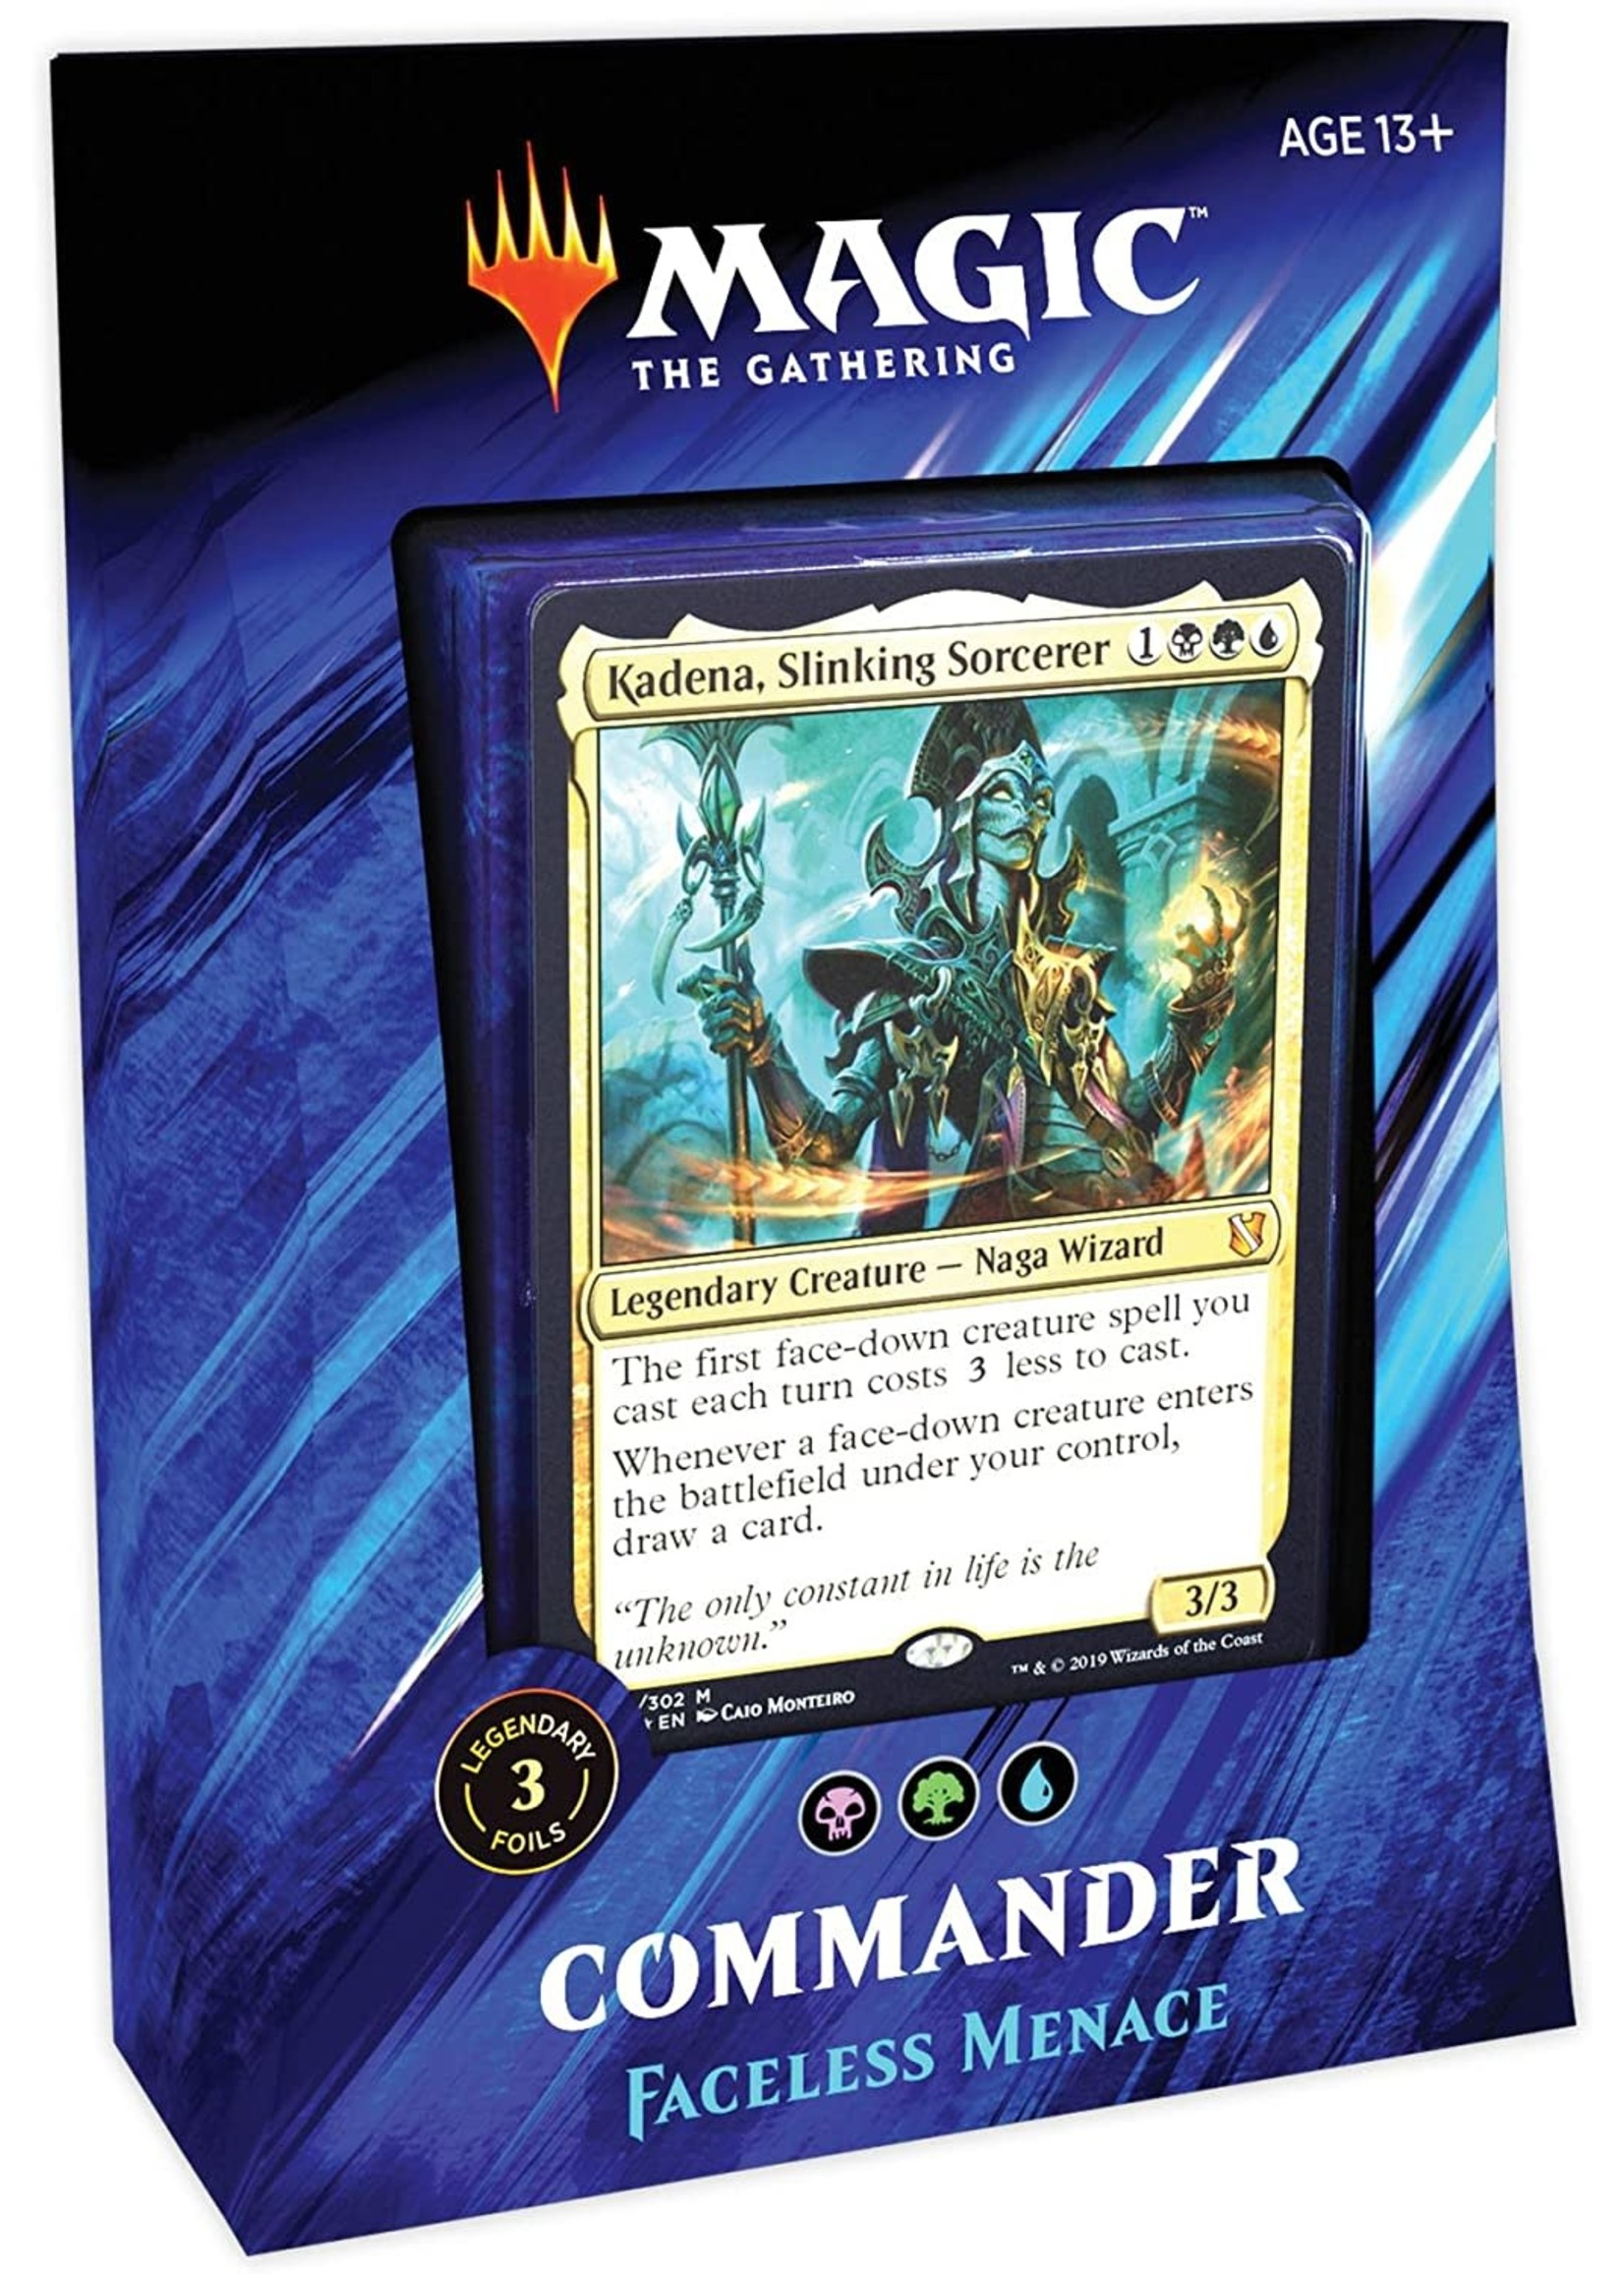 Wizards of the Coast Magic The Gathering Commander Faceless Menace